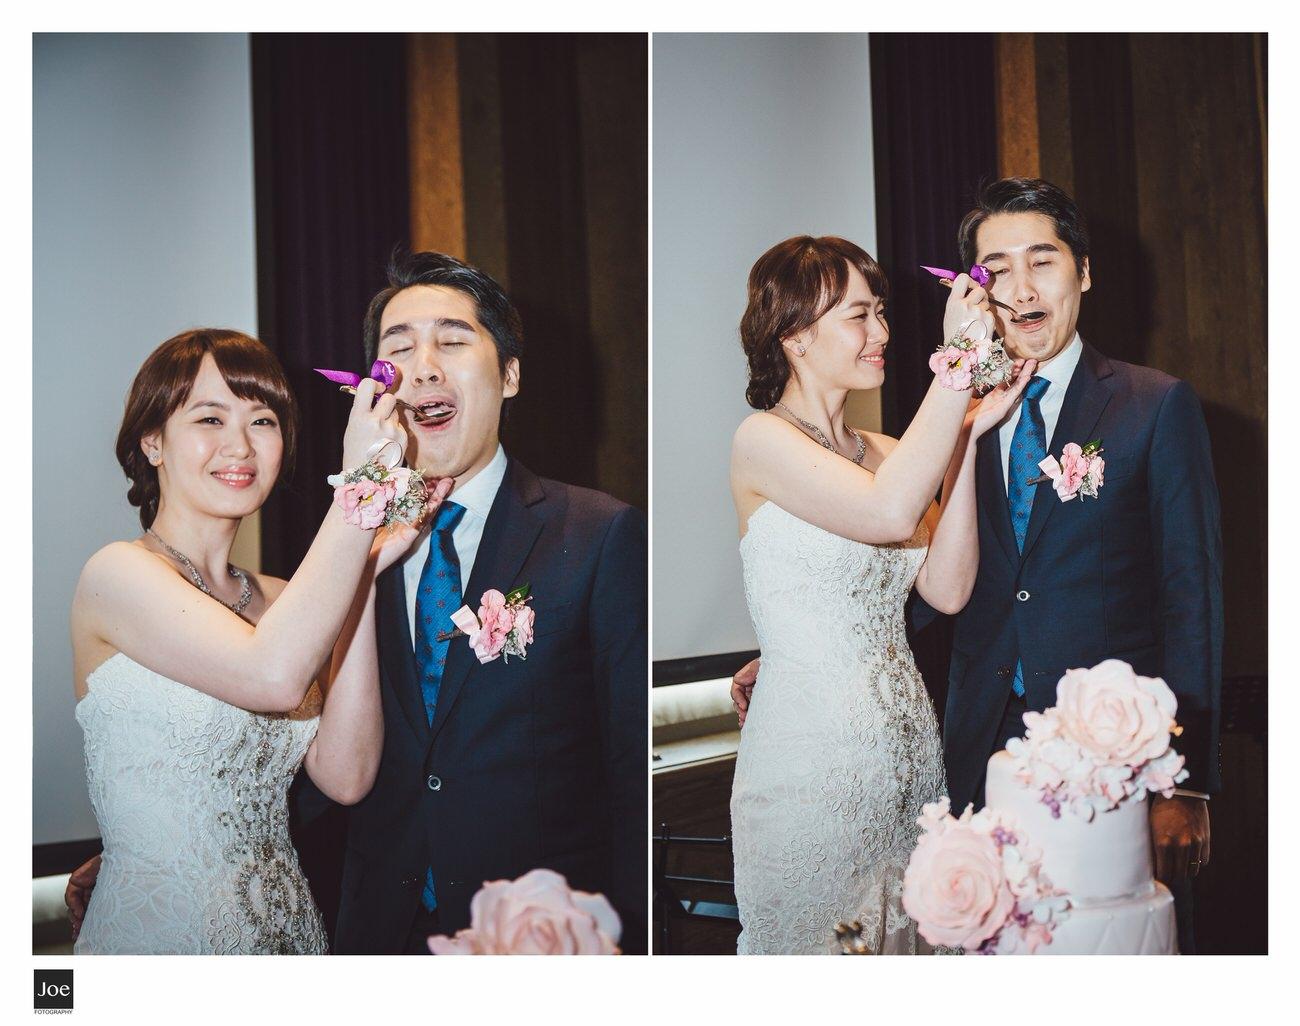 joe-fotography-wedding-photo-palais-de-chine-hotel-025.jpg